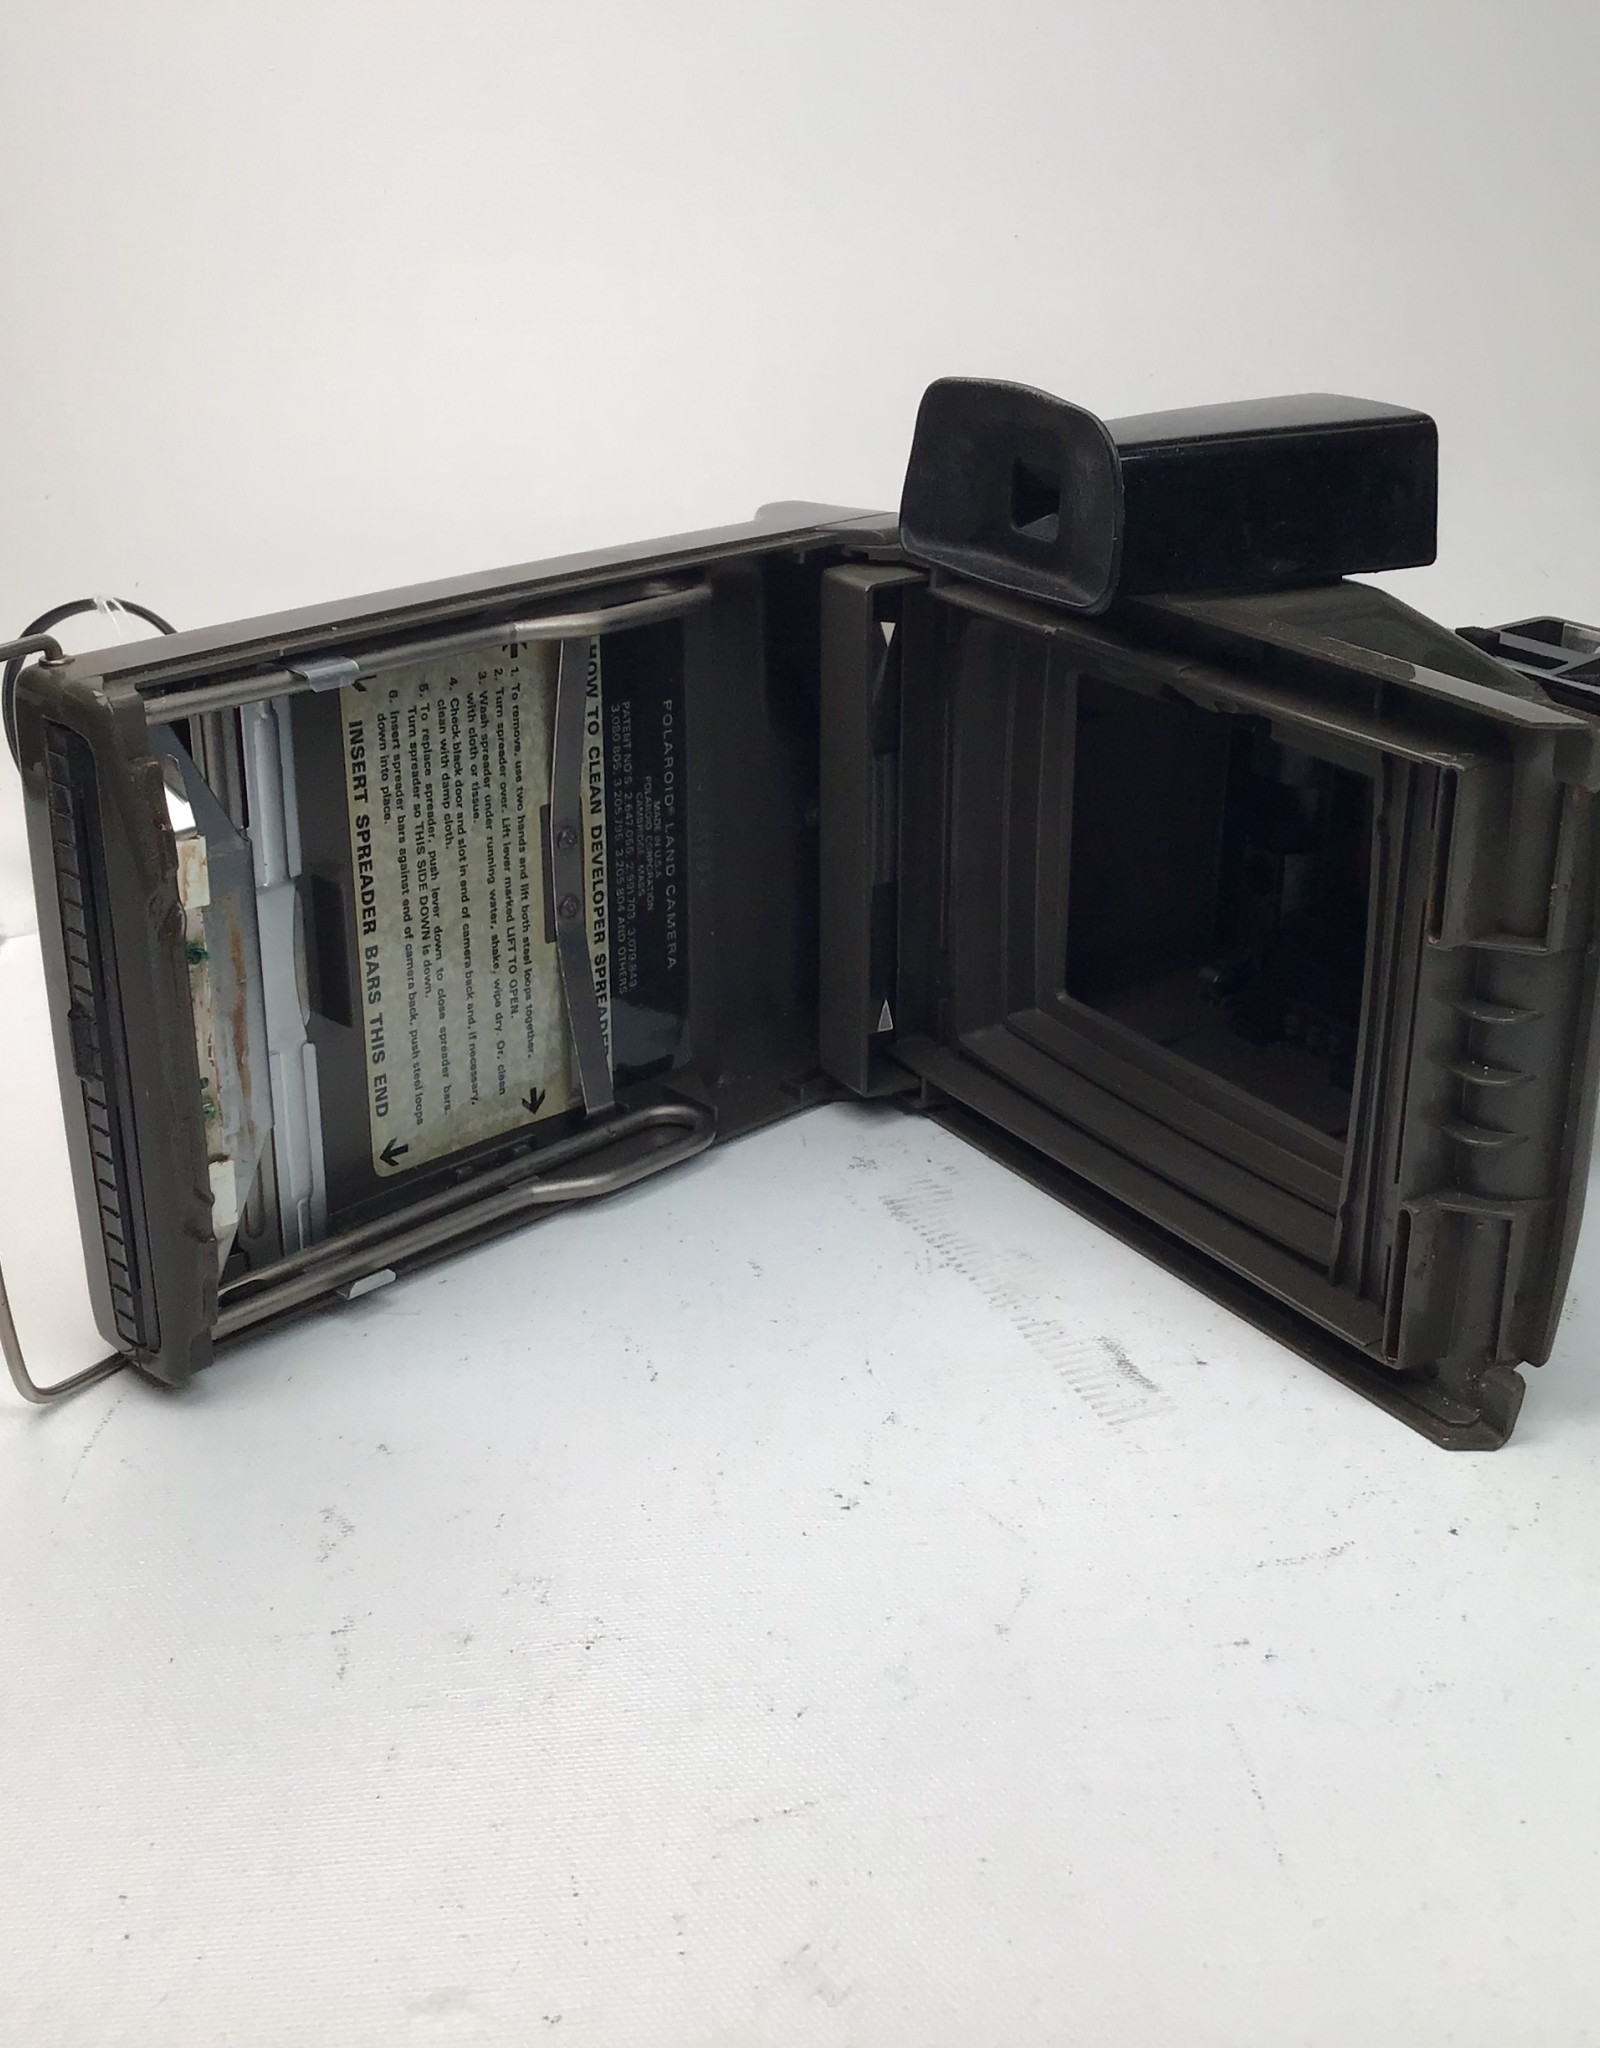 POLAROID Polaroid Colorpack II Camera Used Disp